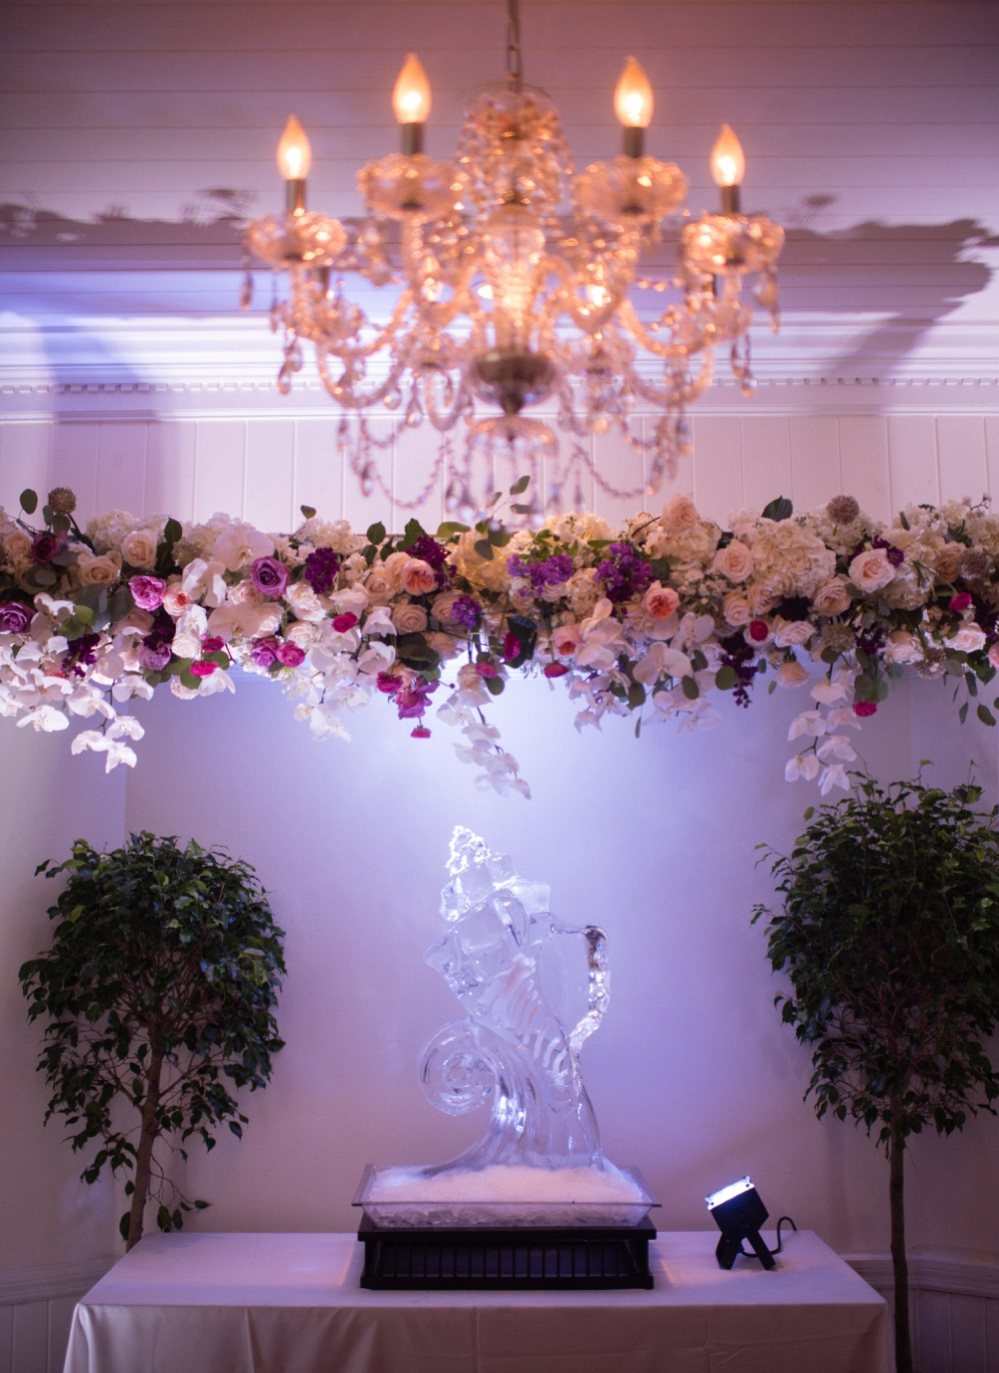 Kelly+McWilliams+Weddings+Matt+Steeves+Photography+Isn%27t+She+Lovely+Floral+South+Seas+Island+Resort+Captiva_0016.jpg